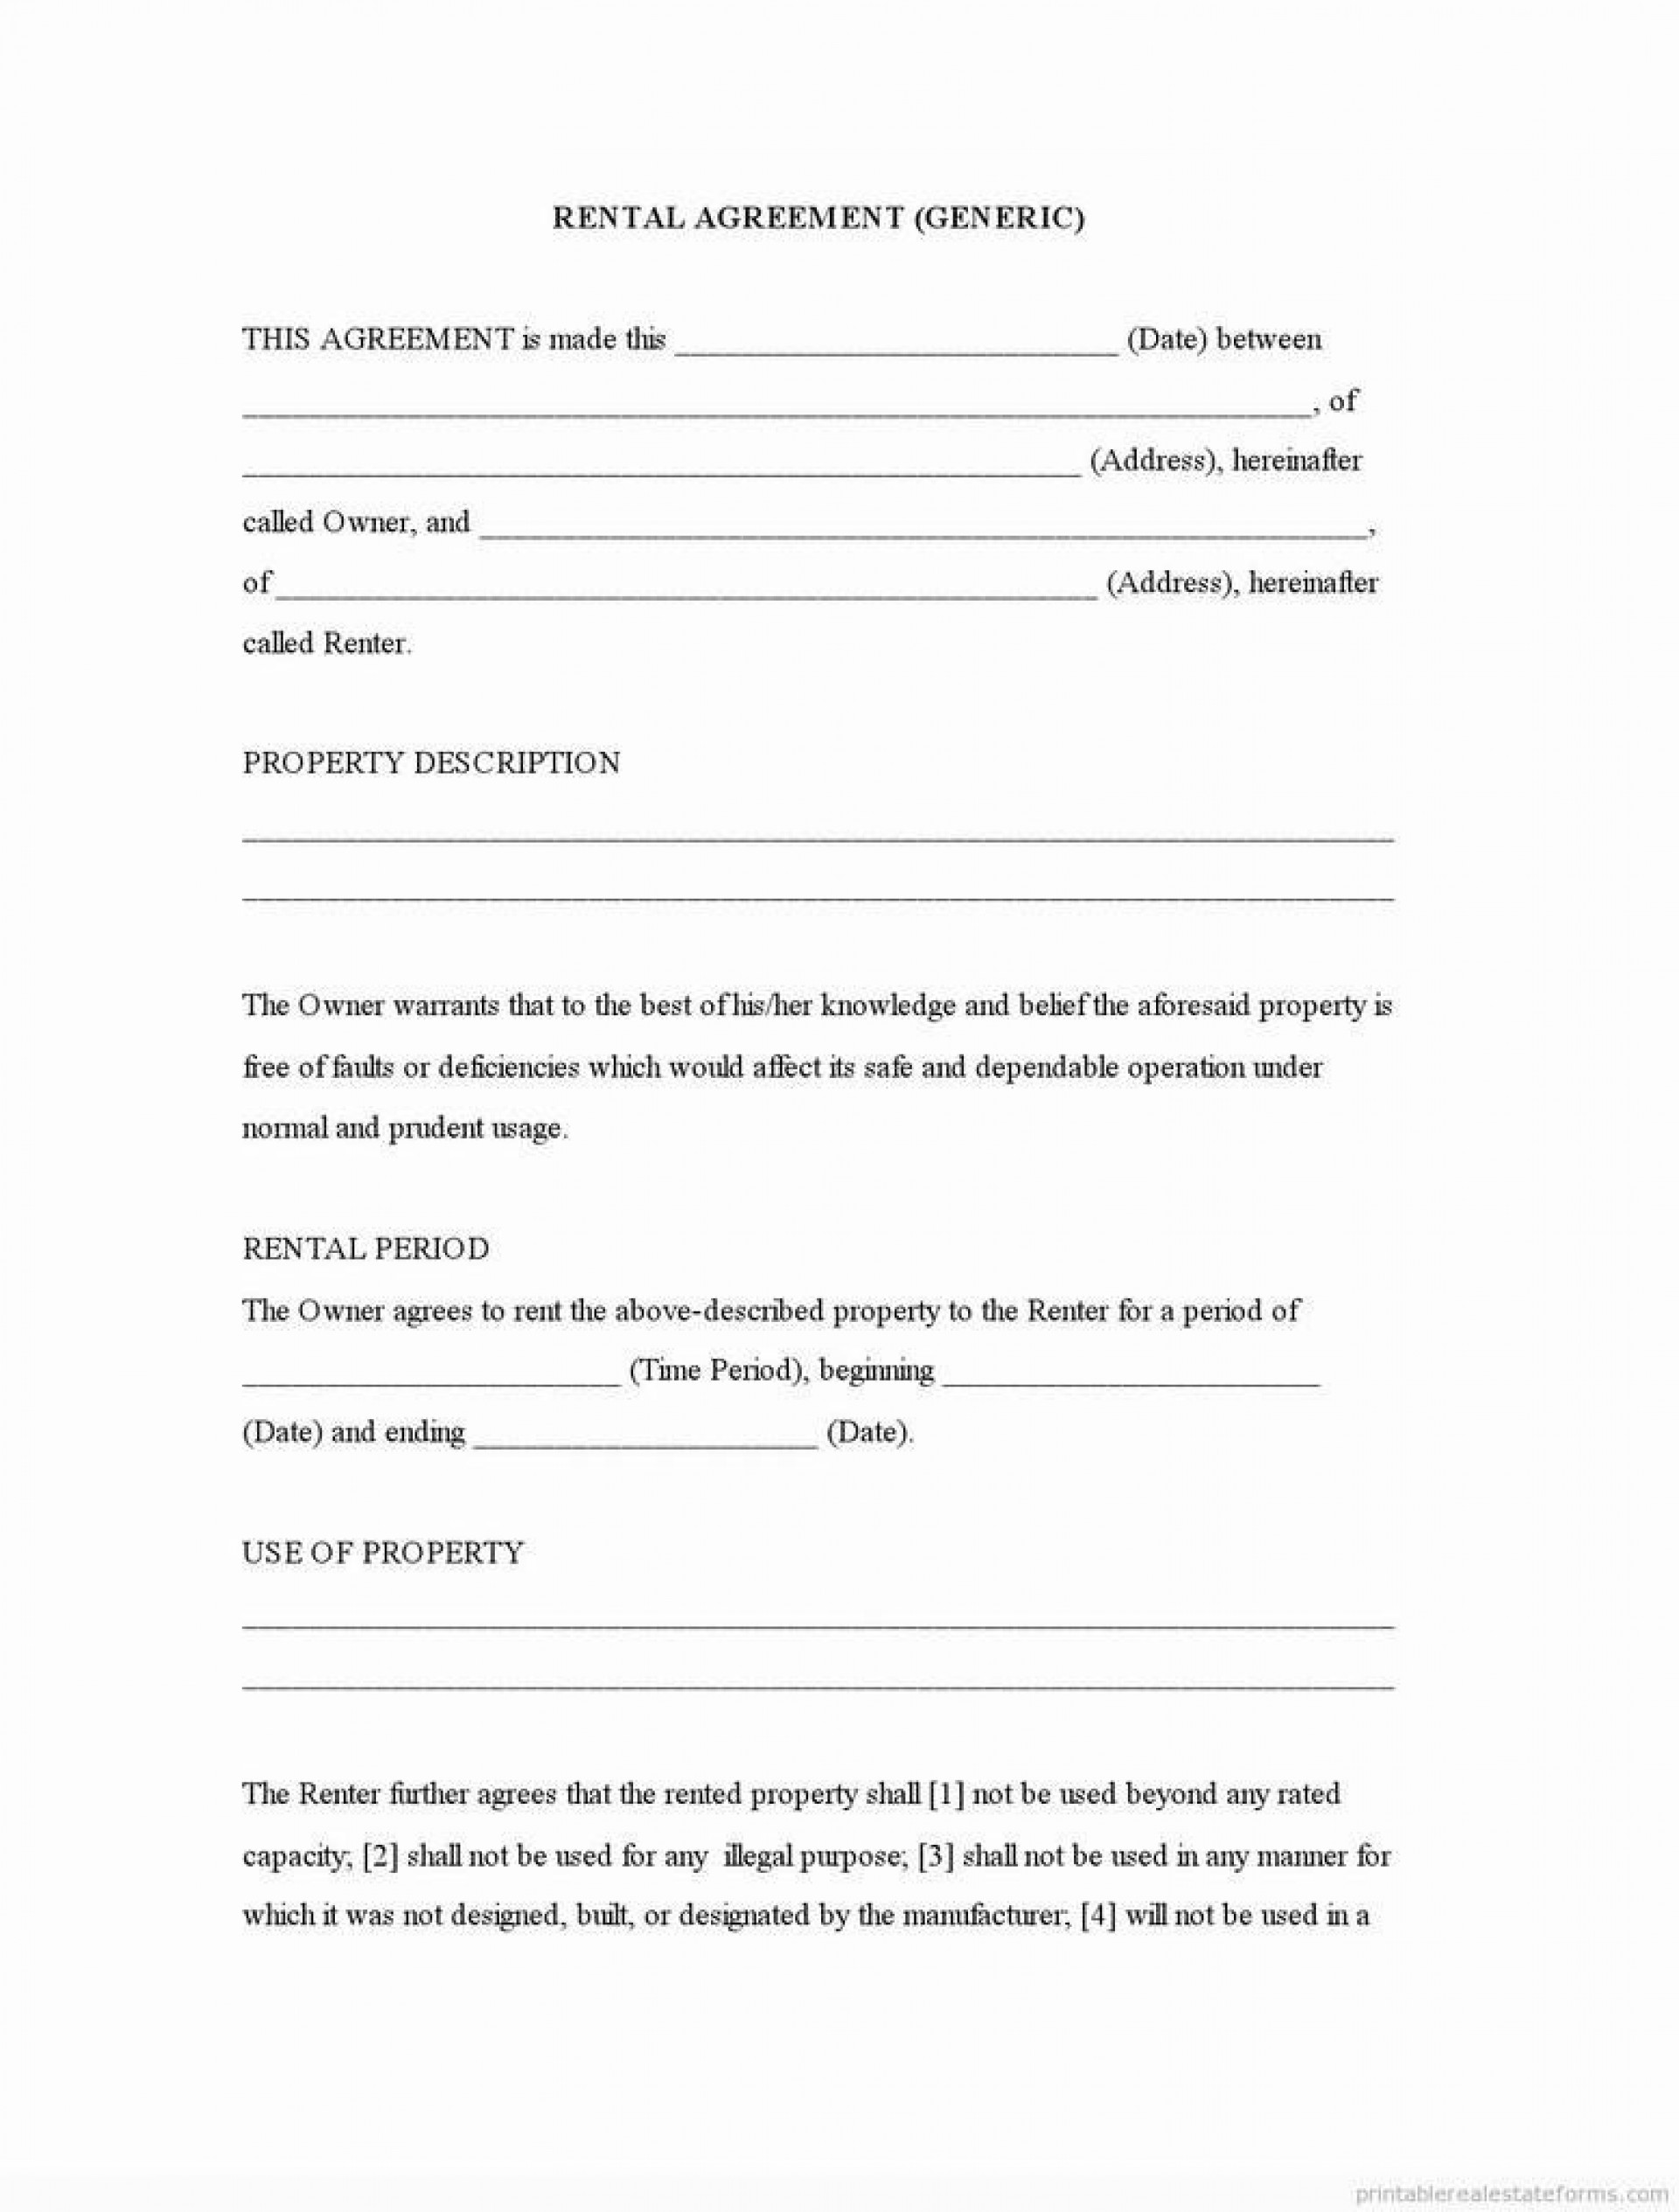 005 Amazing Generic Rental Lease Agreement Concept  Sample Ohio Md Illinoi1920